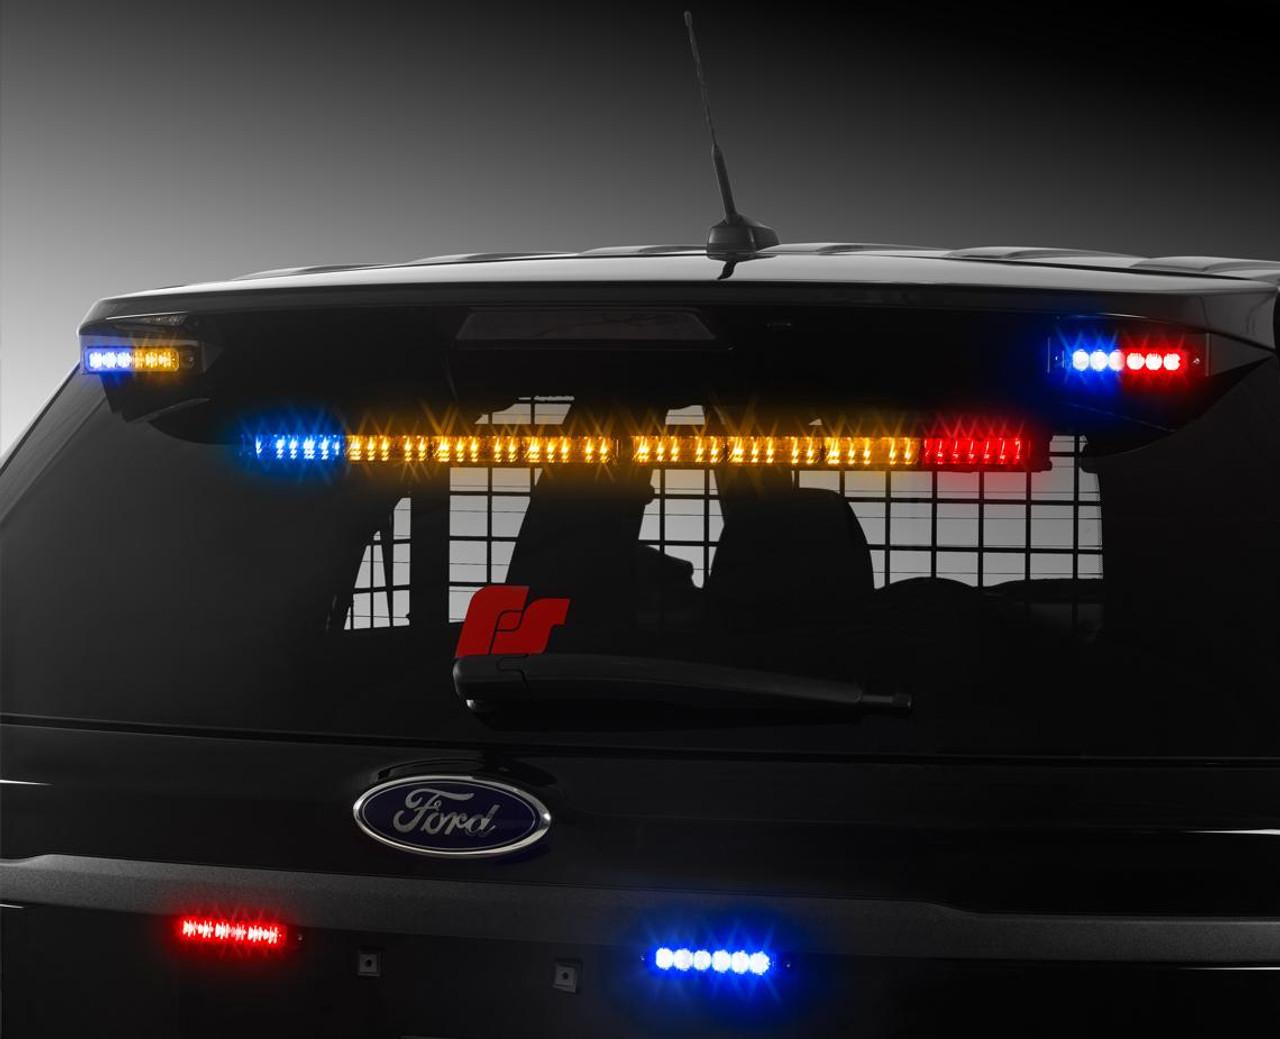 Federal Signal CN SignalMaster Eight LED Light Head Stick, Single or Dual Color with Traffic Advisor